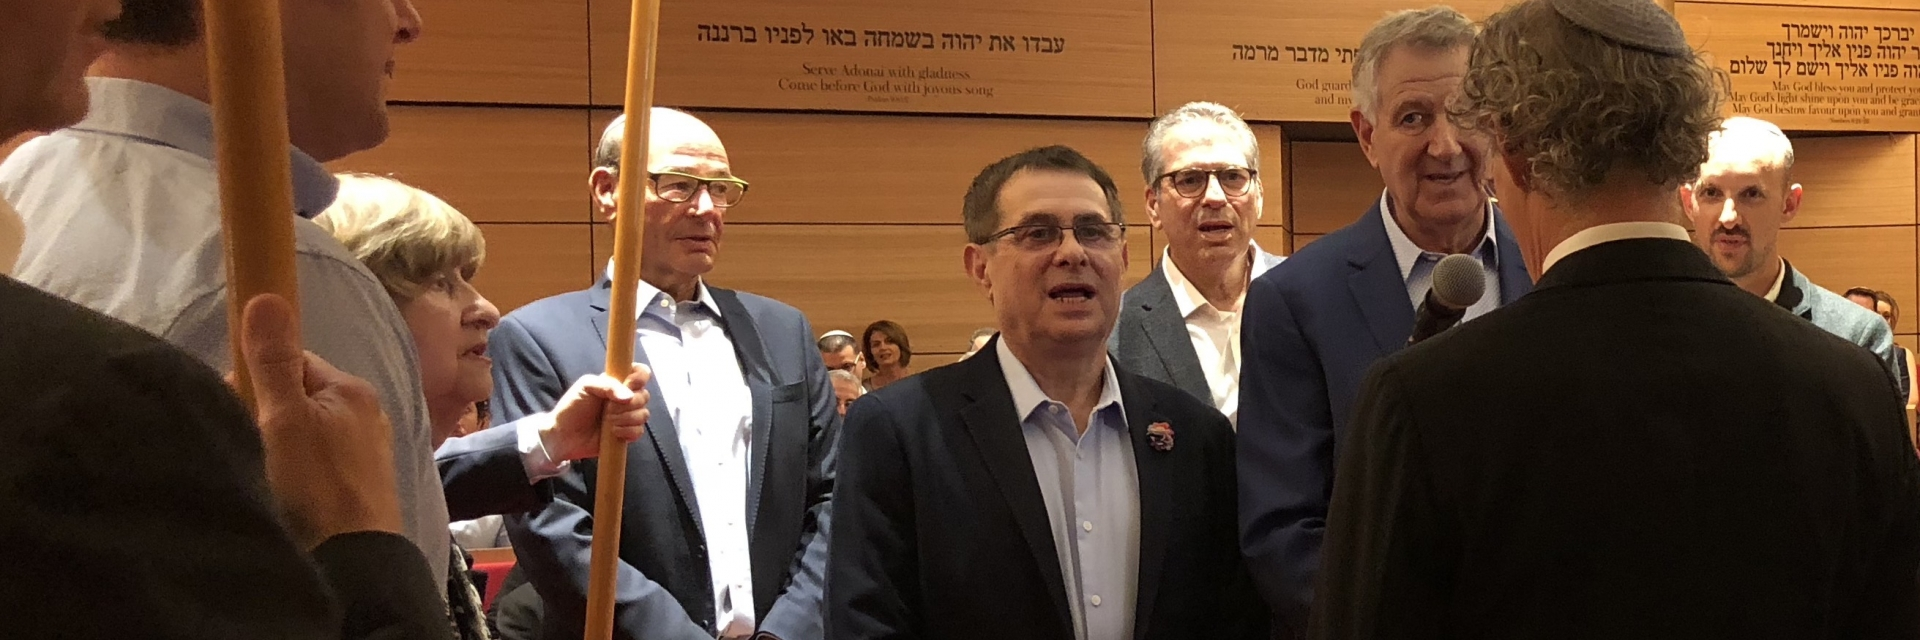 25th World Congress Jewish LGBT+ Conference